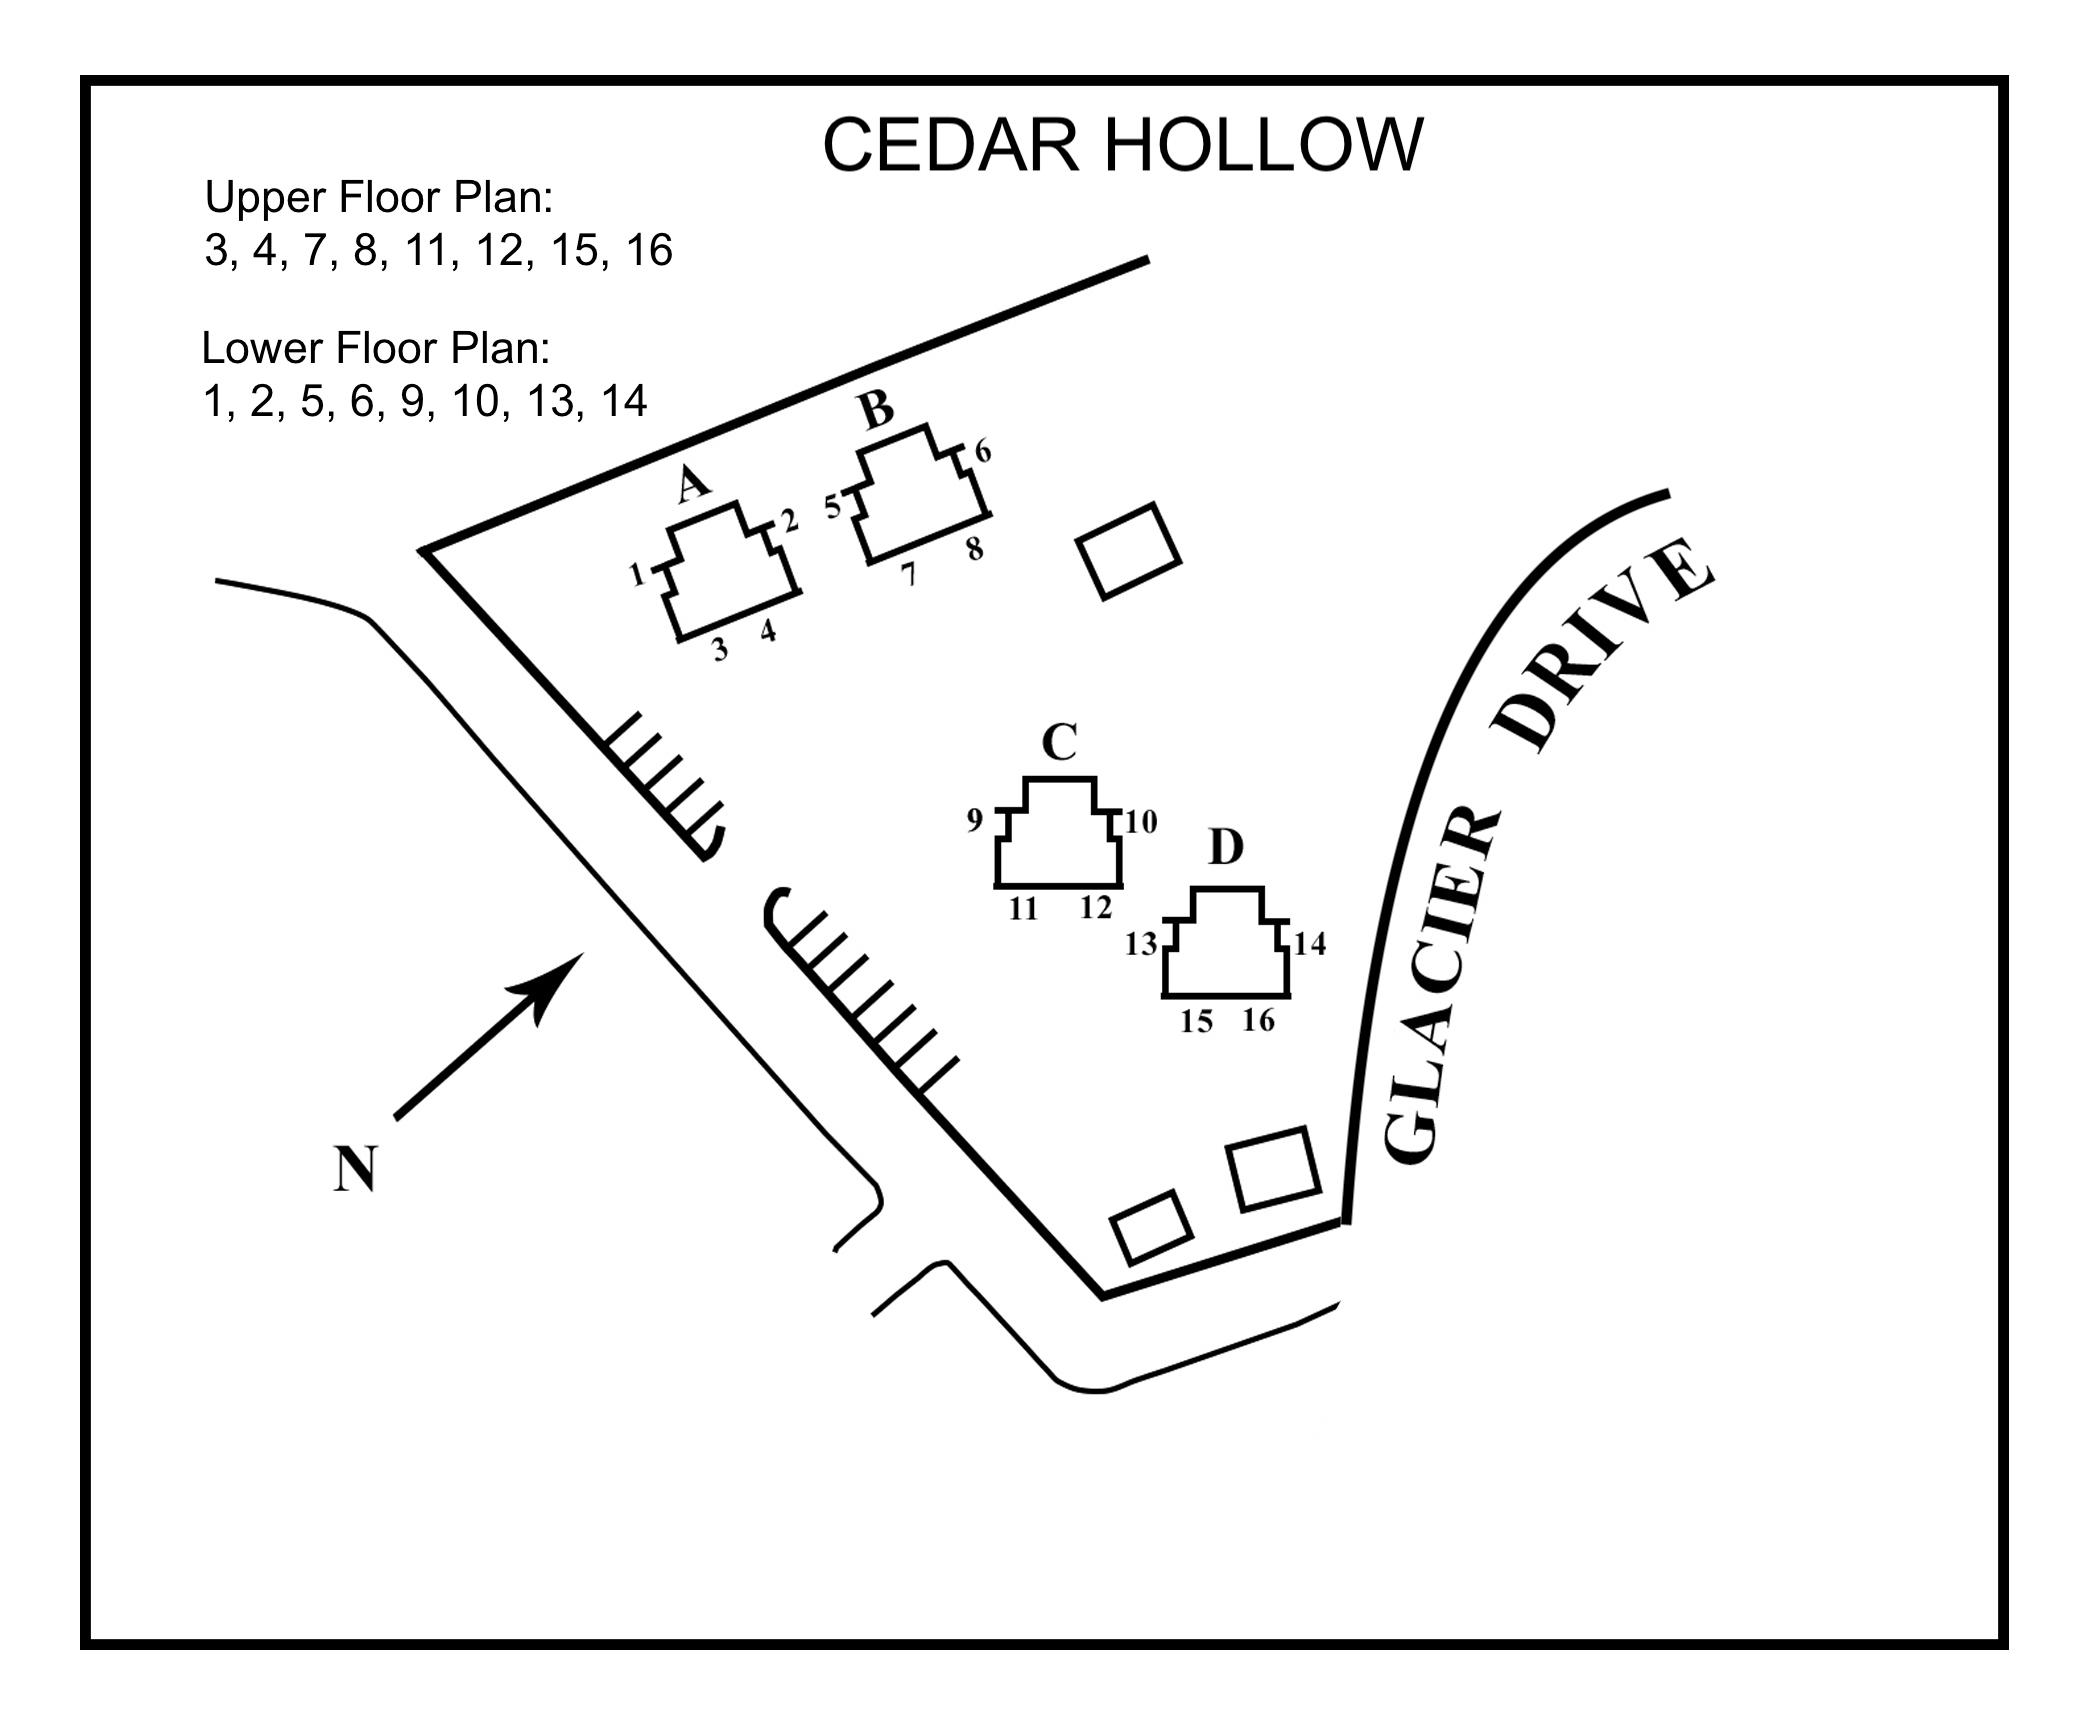 Cedar Hollow Site Floor Plan with upper lower key floor plans